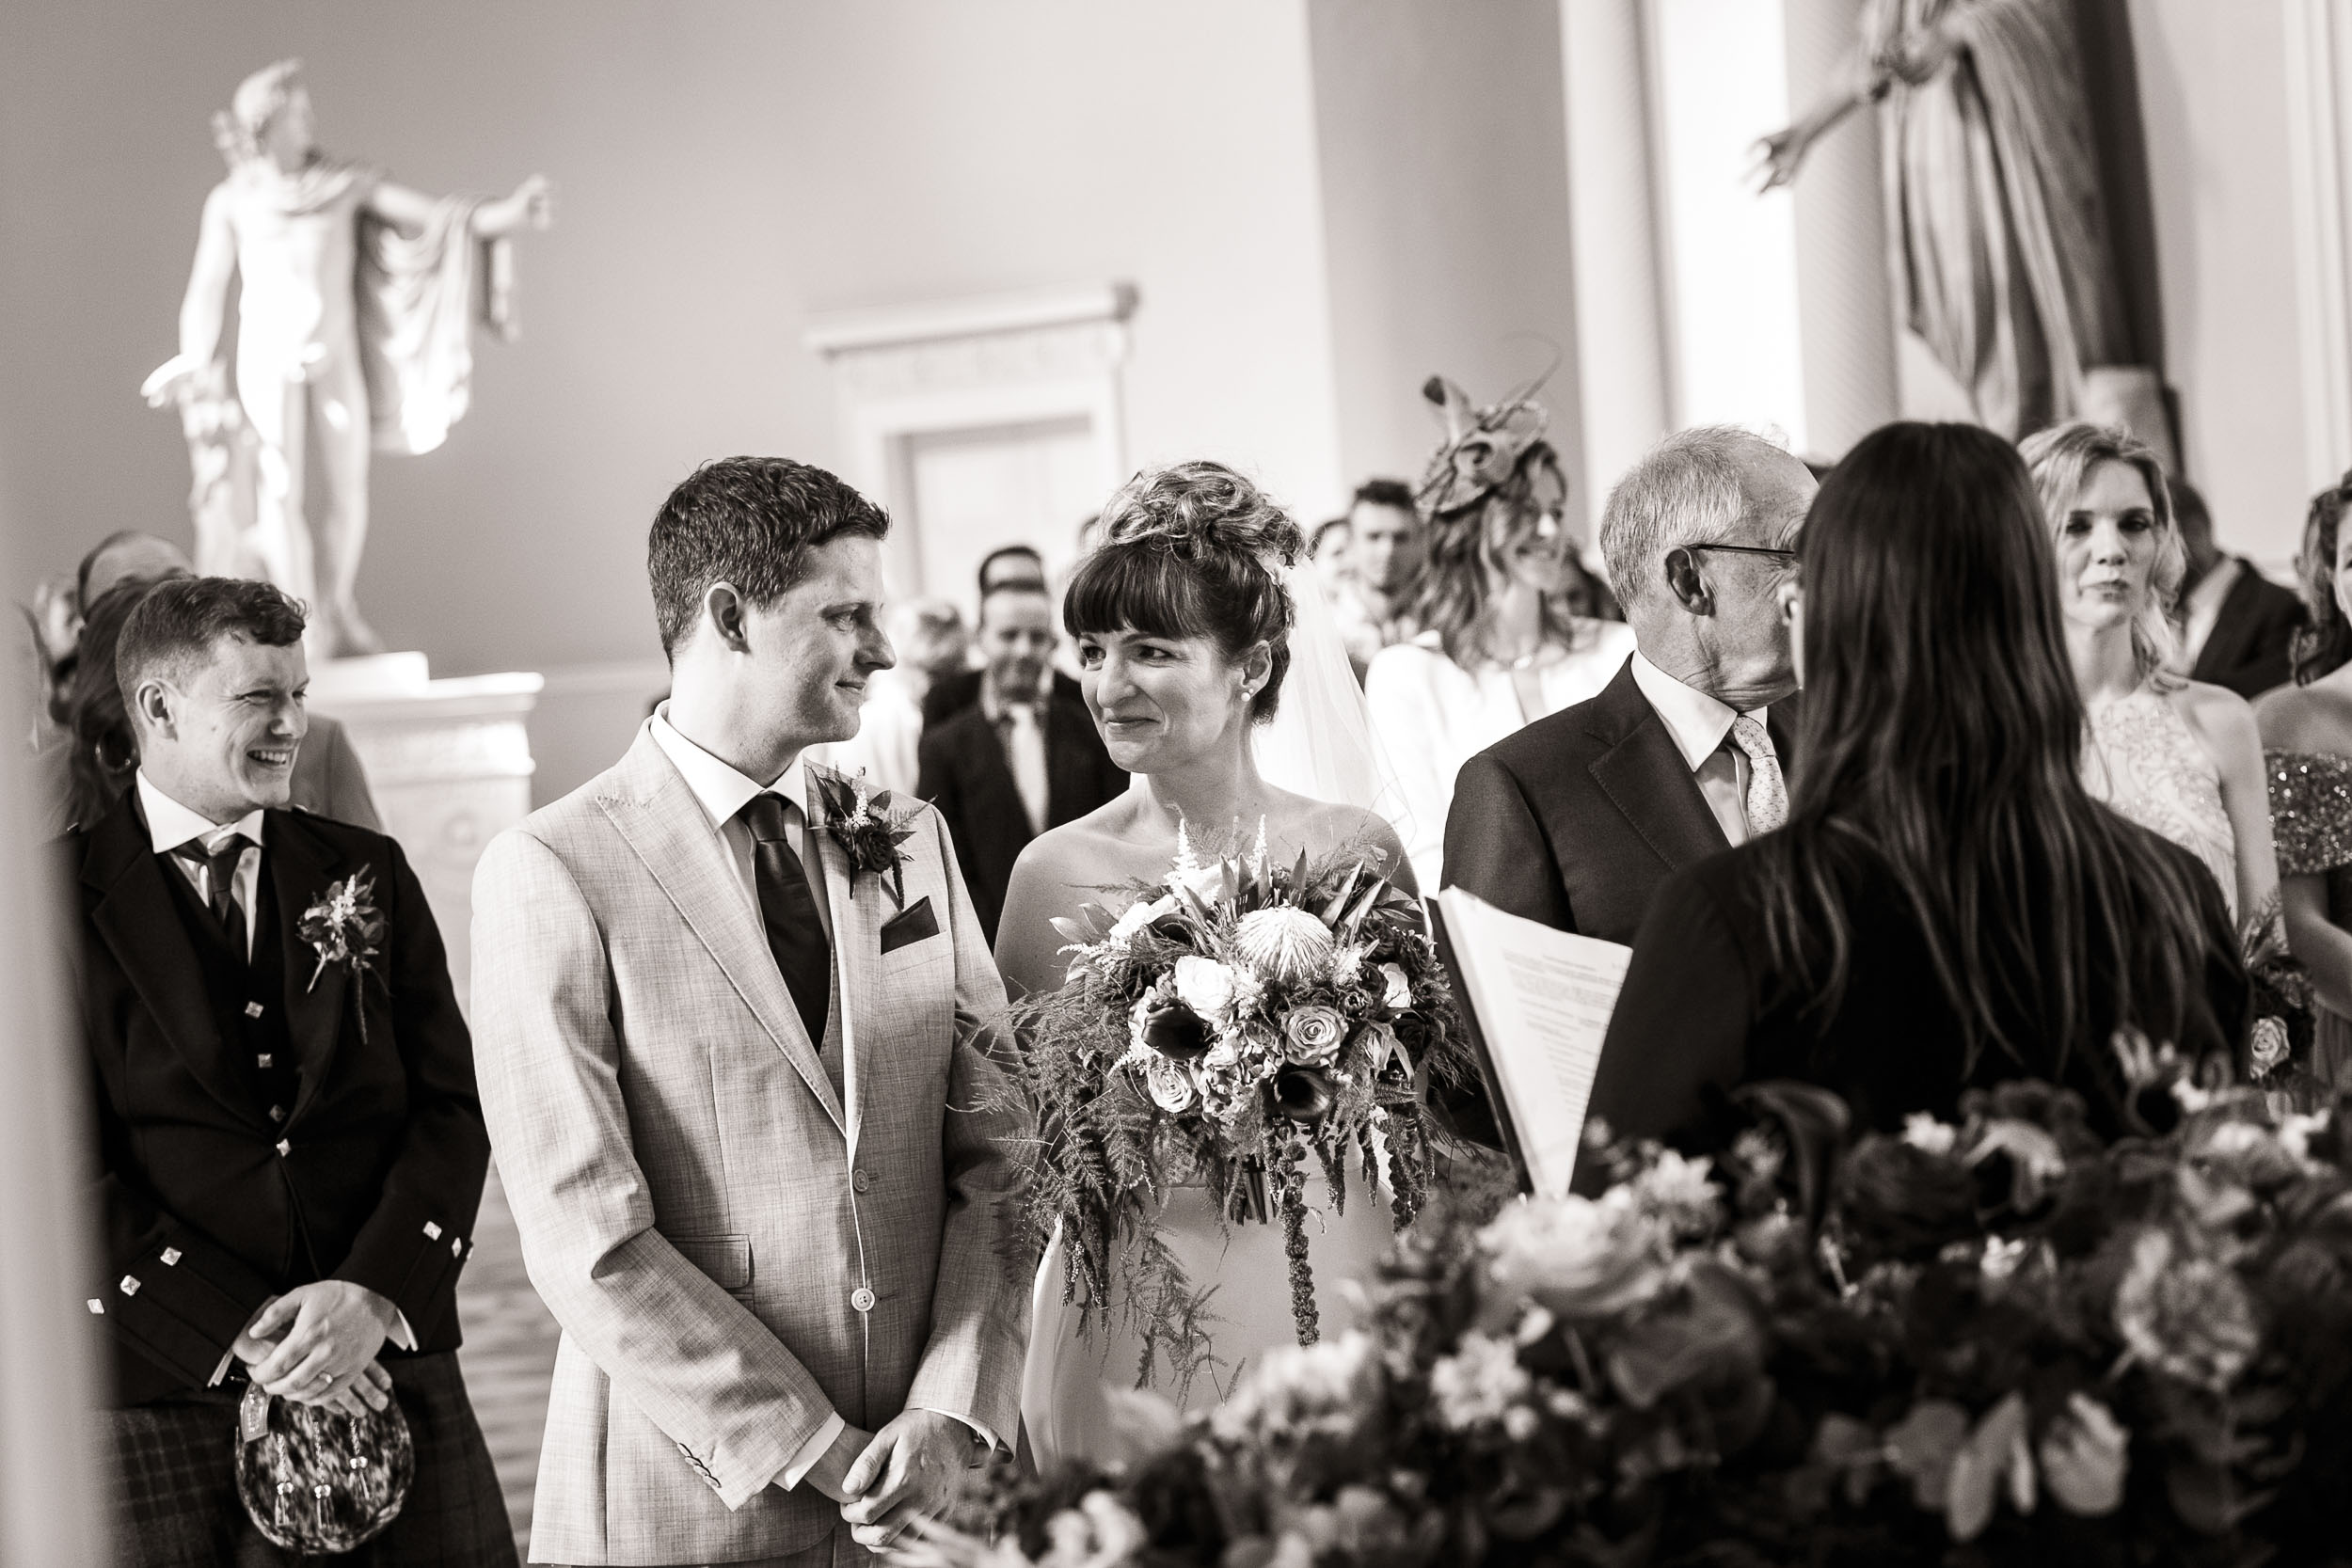 syon-house-wedding-photographer-london 052.jpg